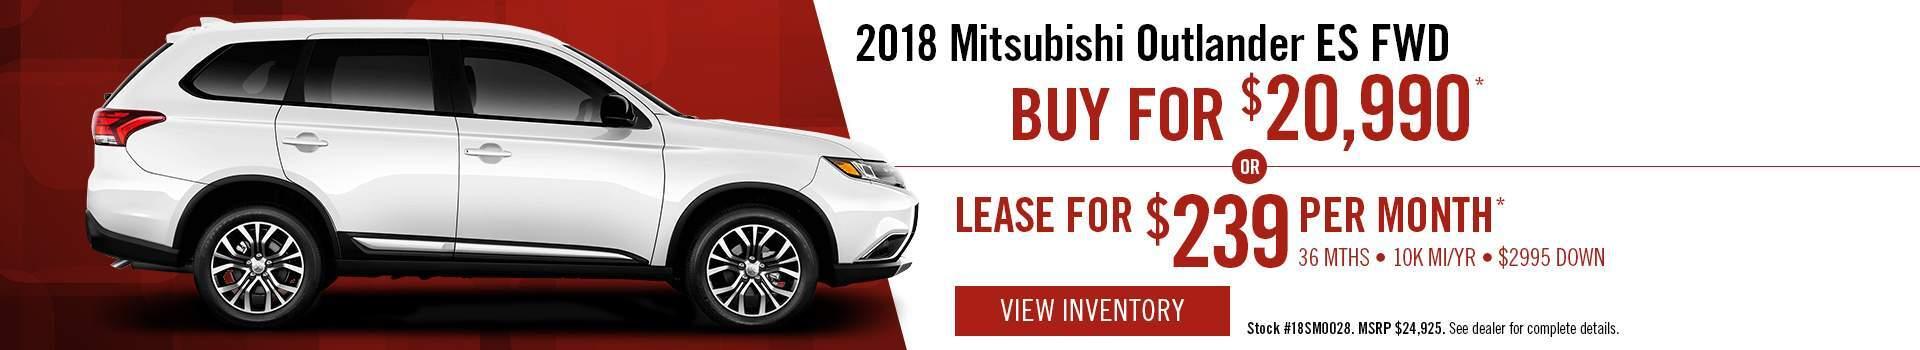 Mitsubishi Dealership Sheffield OH Used Cars Spitzer Mitsubishi - Ohio mitsubishi dealers